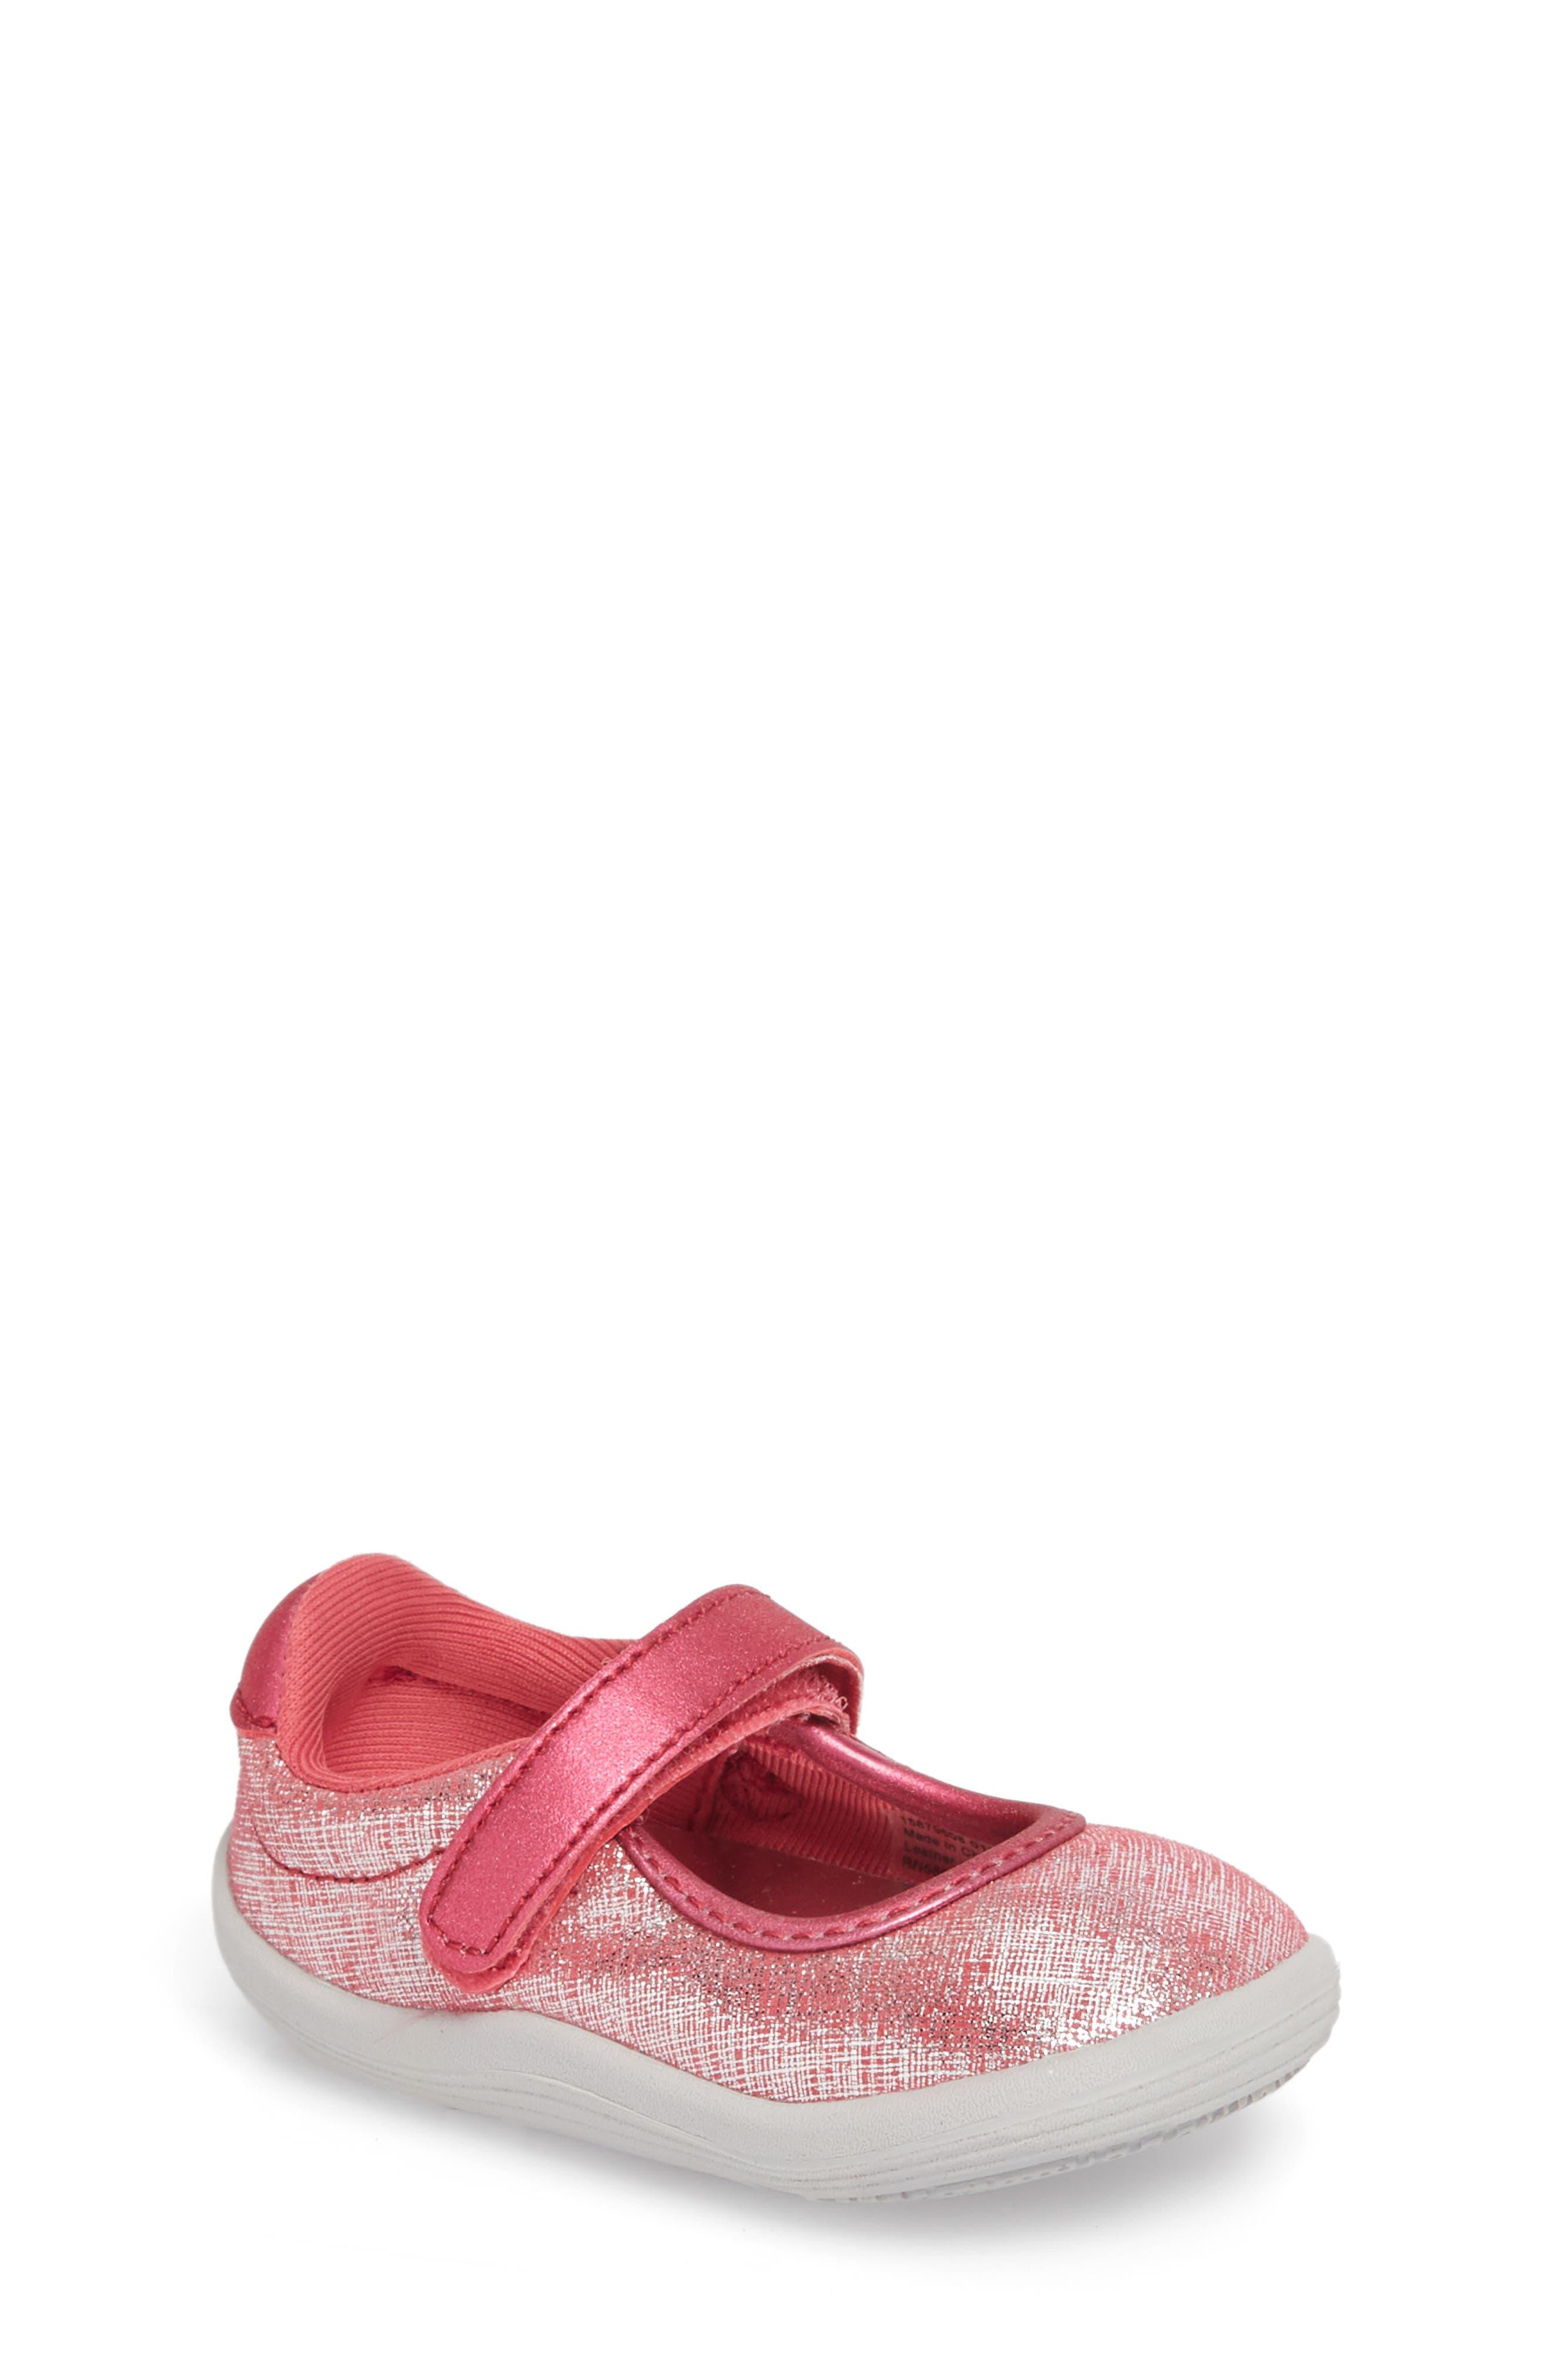 Nora Metallic Mary Jane Sneaker,                             Main thumbnail 1, color,                             650